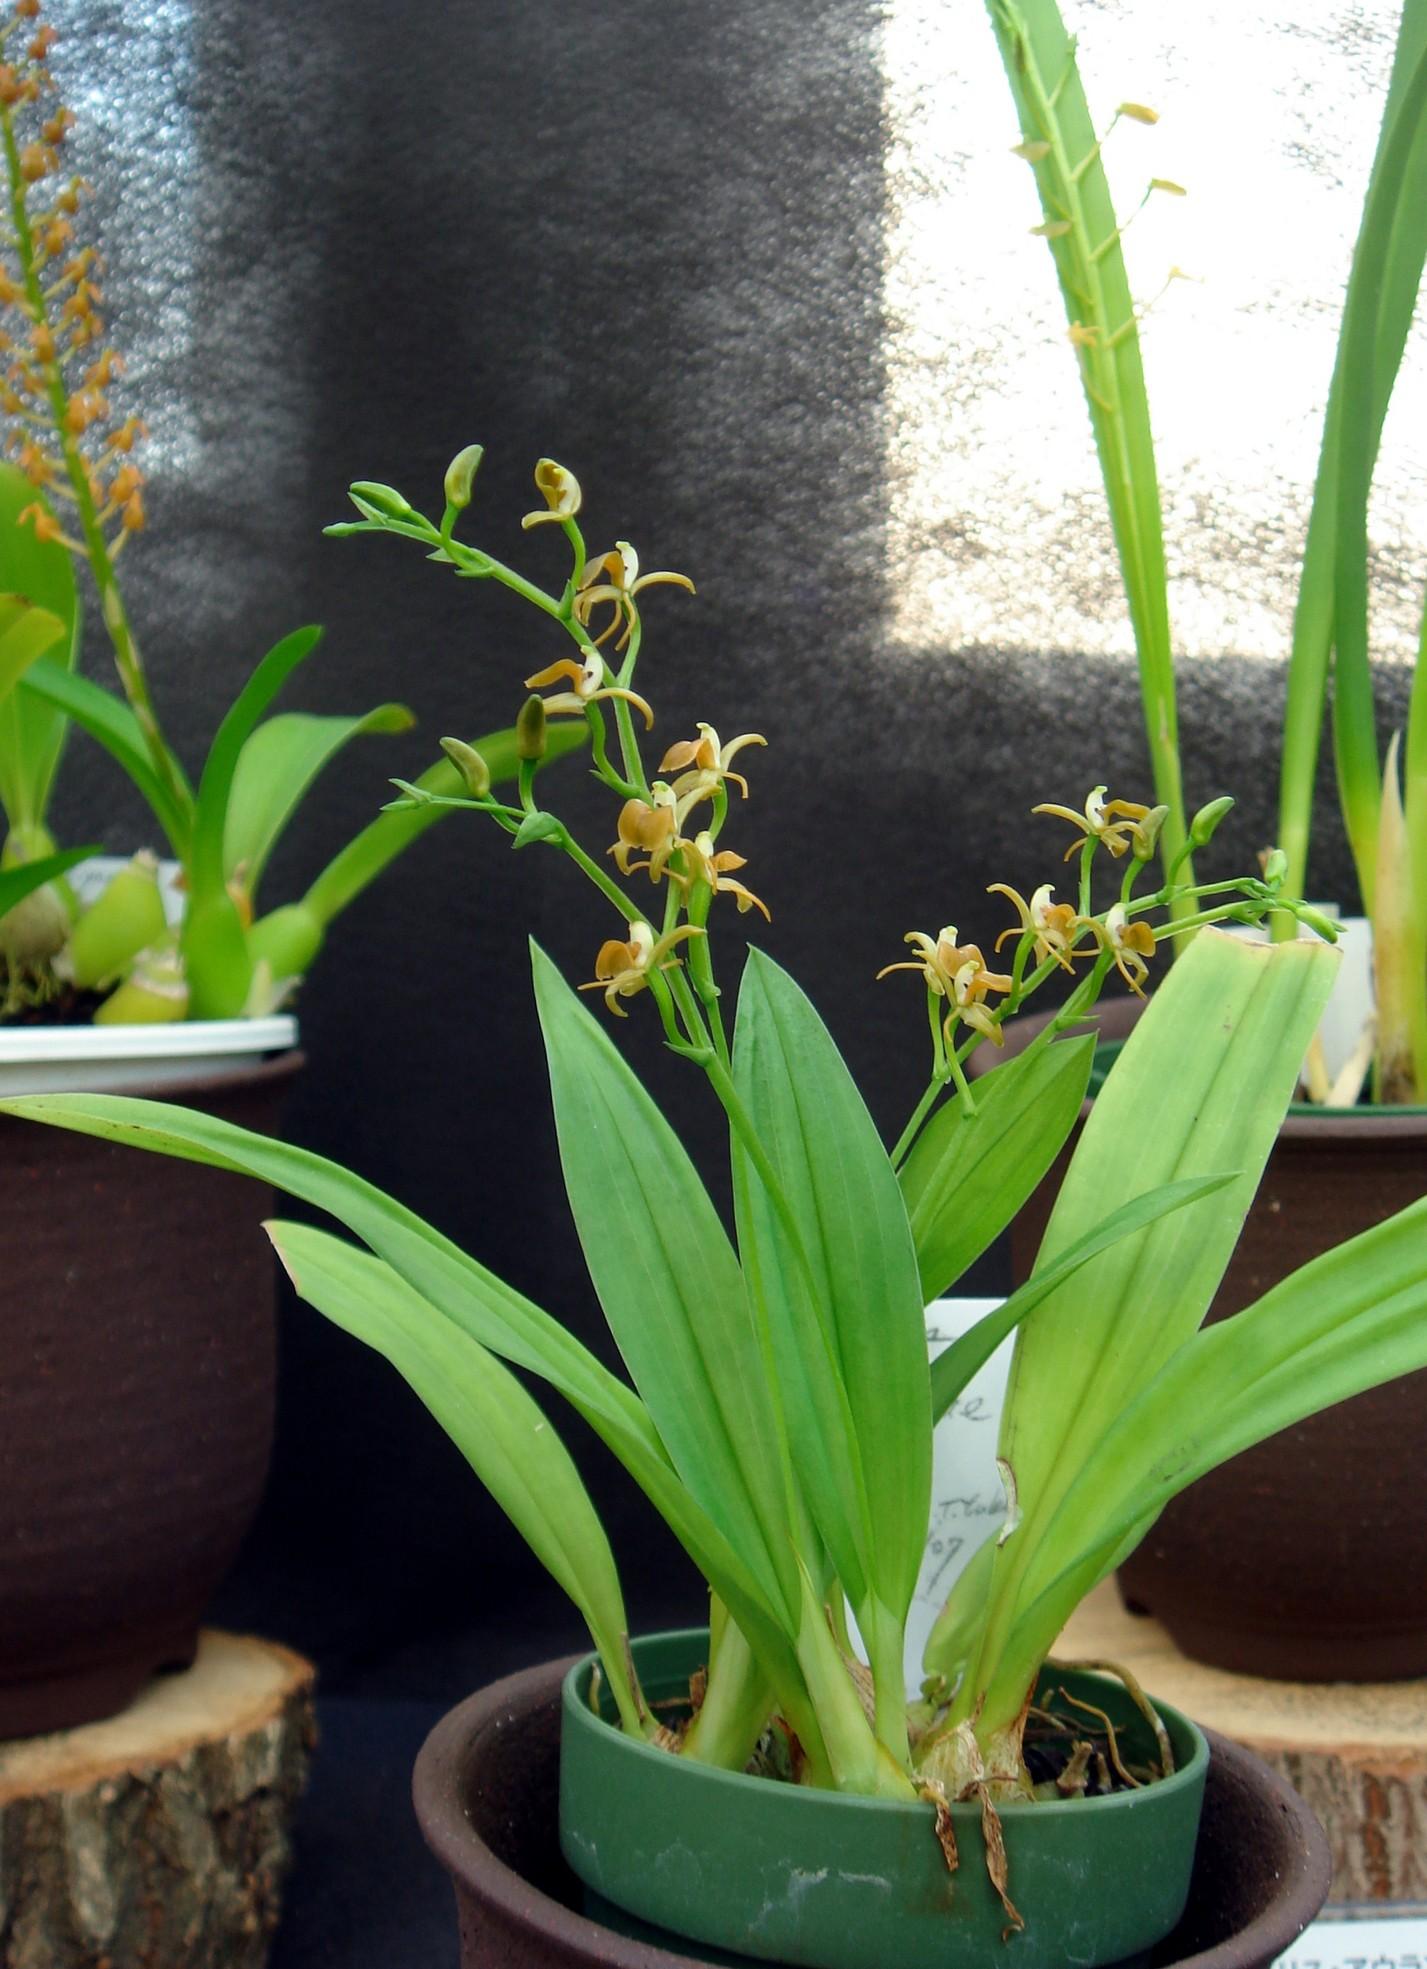 http://orchids.la.coocan.jp/Liparis/Liparis%20balansae/DSC09428.JPG